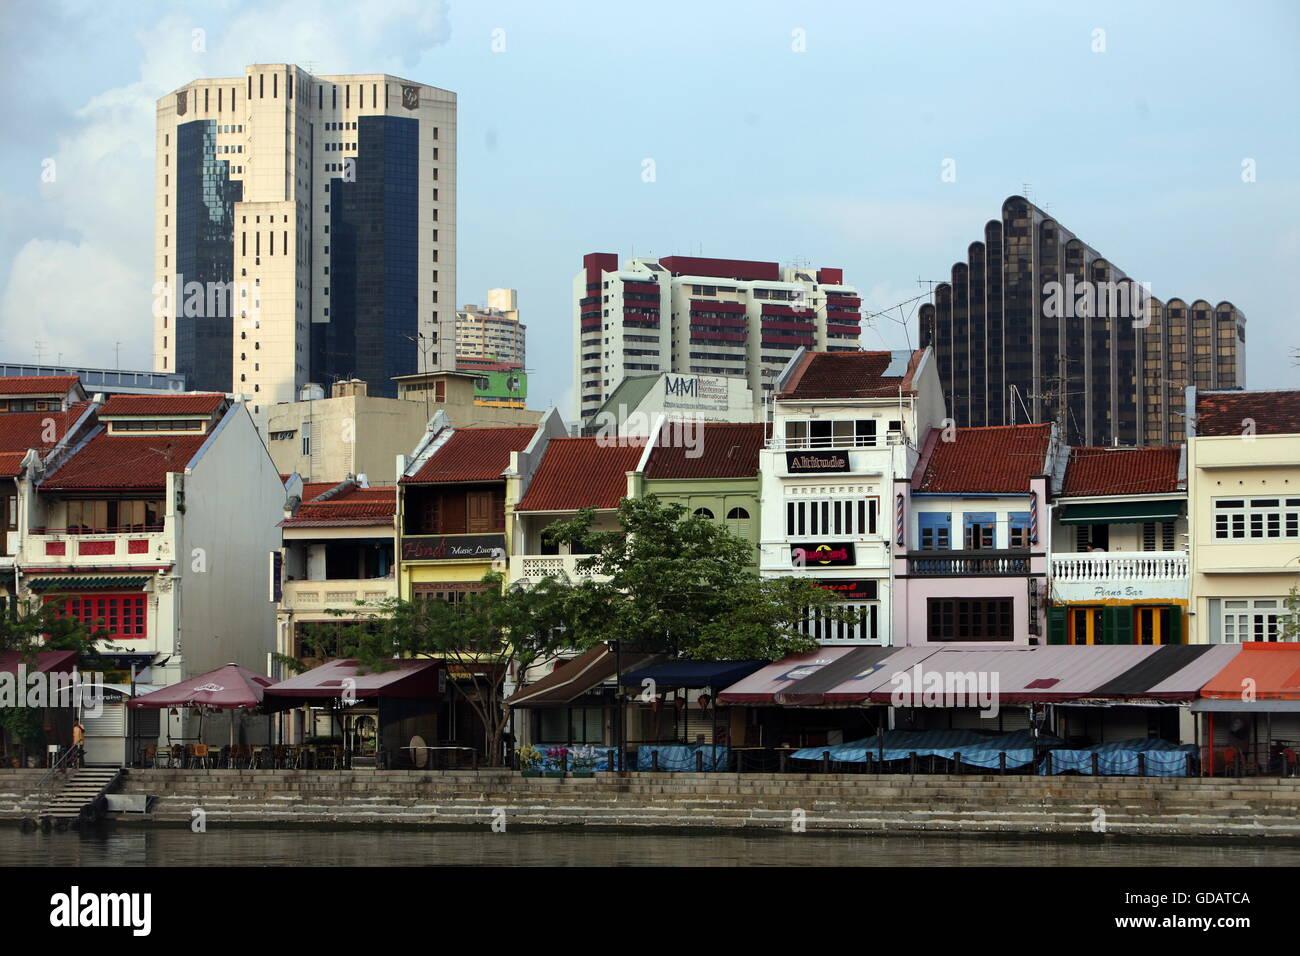 Asien, Suedost, Singapur, Insel, Staat, Stadt, City, Skyline, Zentrum, Boat Quay, Bankenviertel, Promenade, Restaurant, Stock Photo